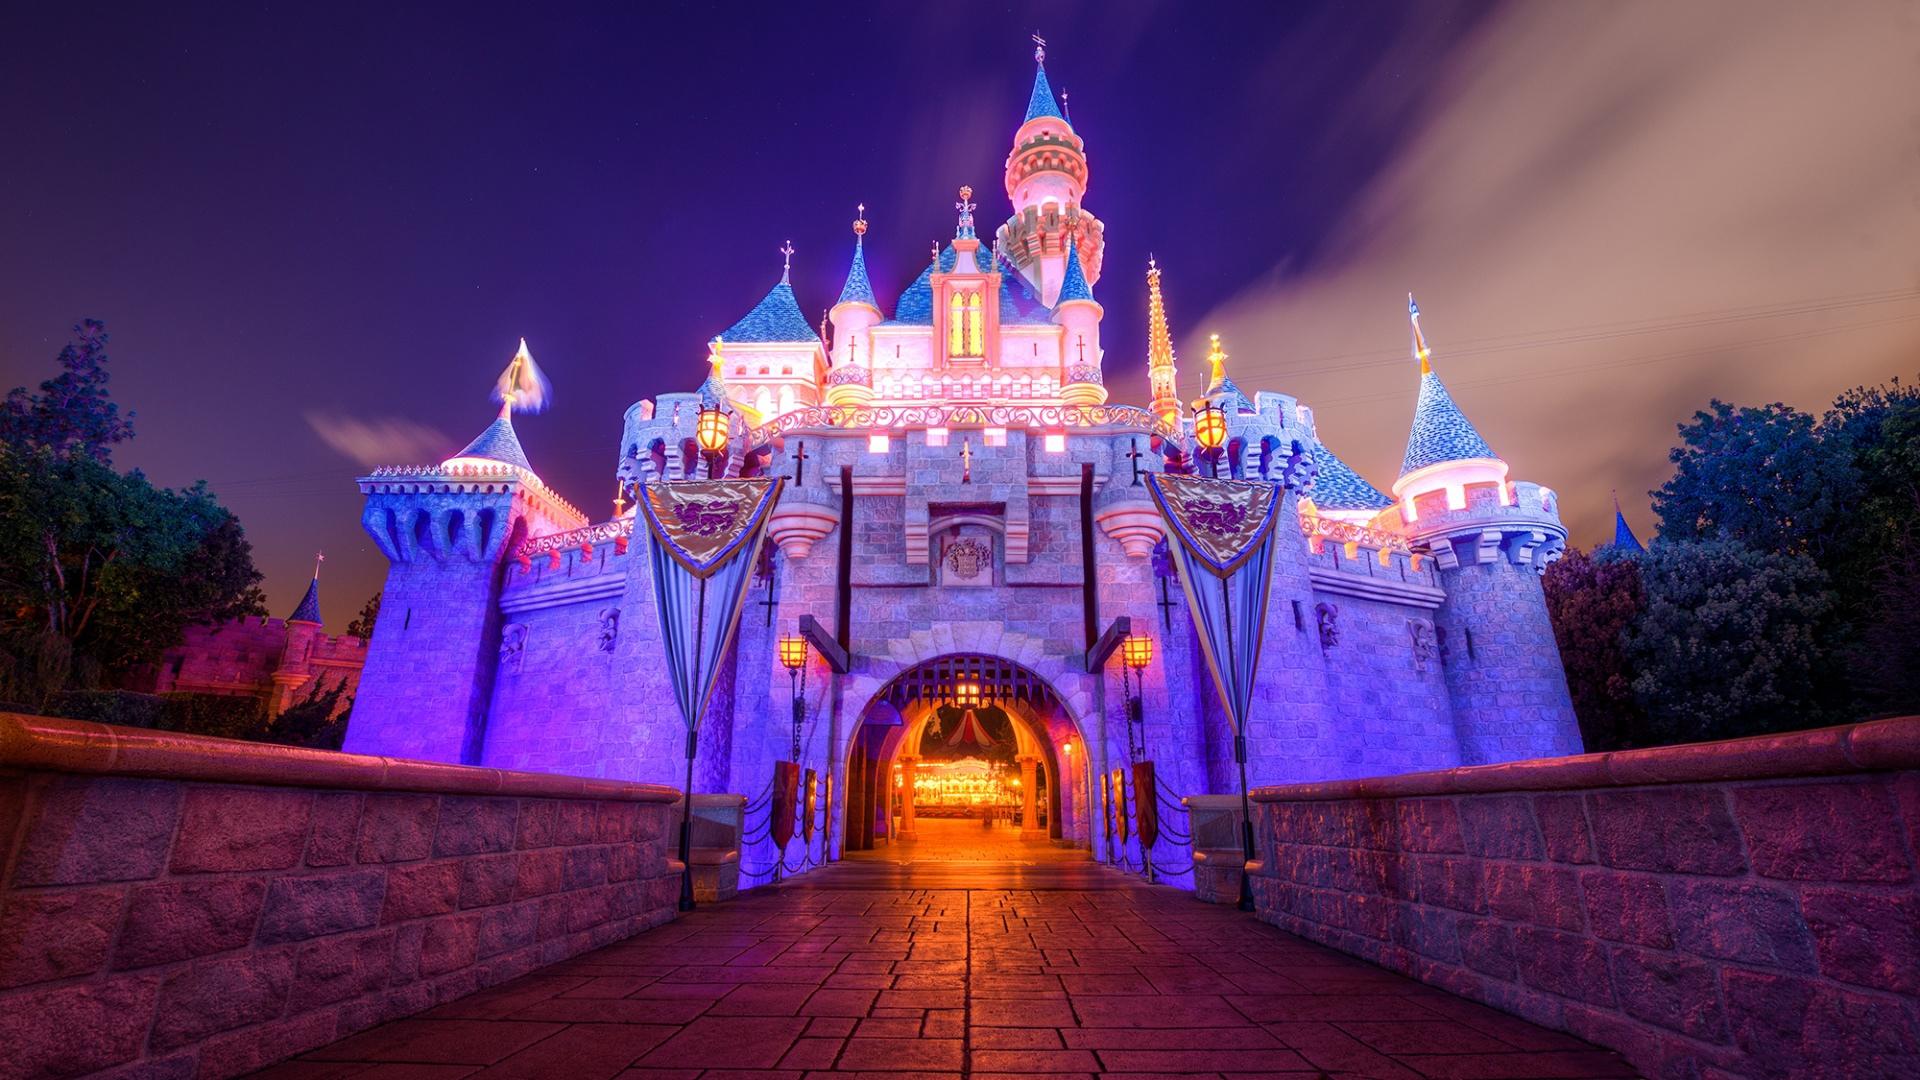 Disneyland Castle Beautiful In The Night